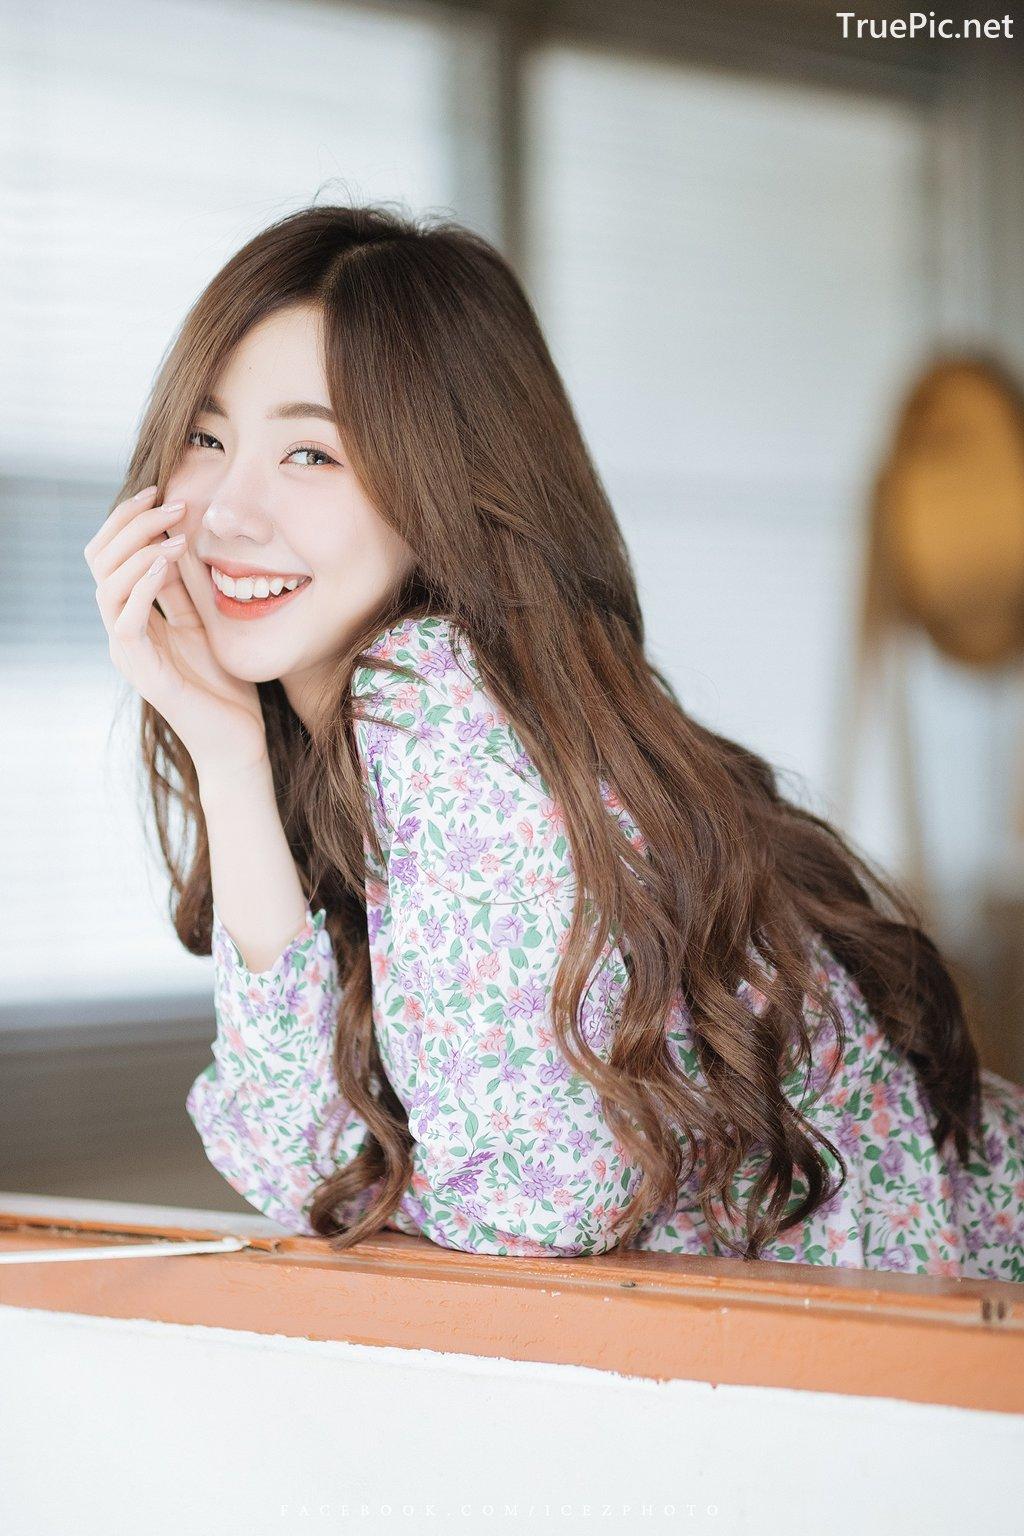 Image-Thailand-Hot-Girl-Nilawan-Iamchuasawad-Pure-Beauty-Early-Morning-TruePic.net- Picture-2